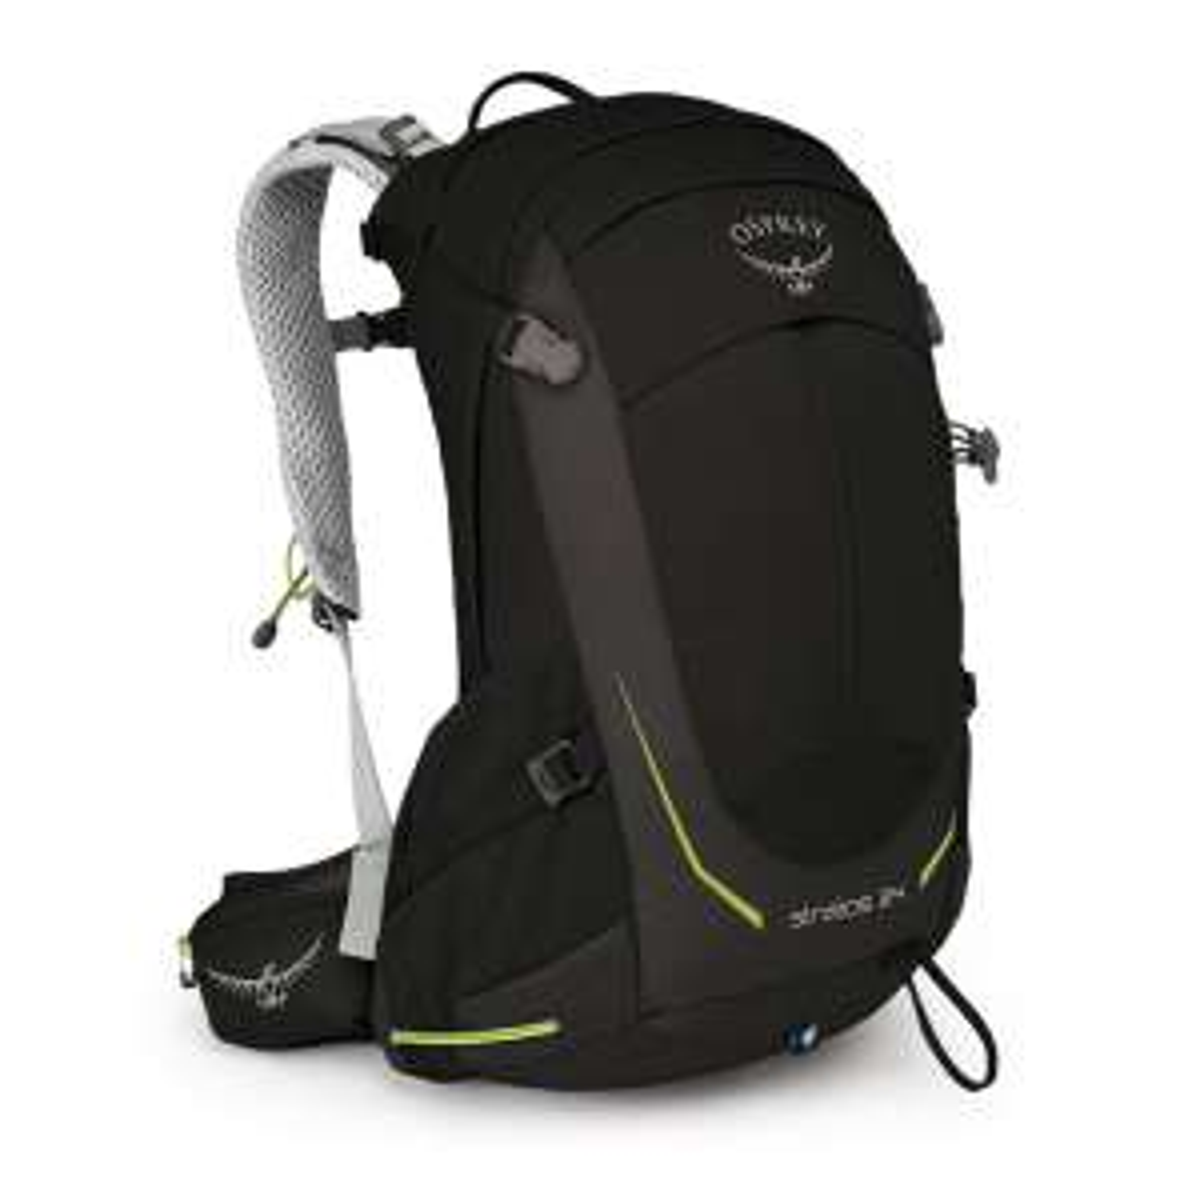 (Wiggle) Osprey Stratos 24L (Wander-) Rucksack